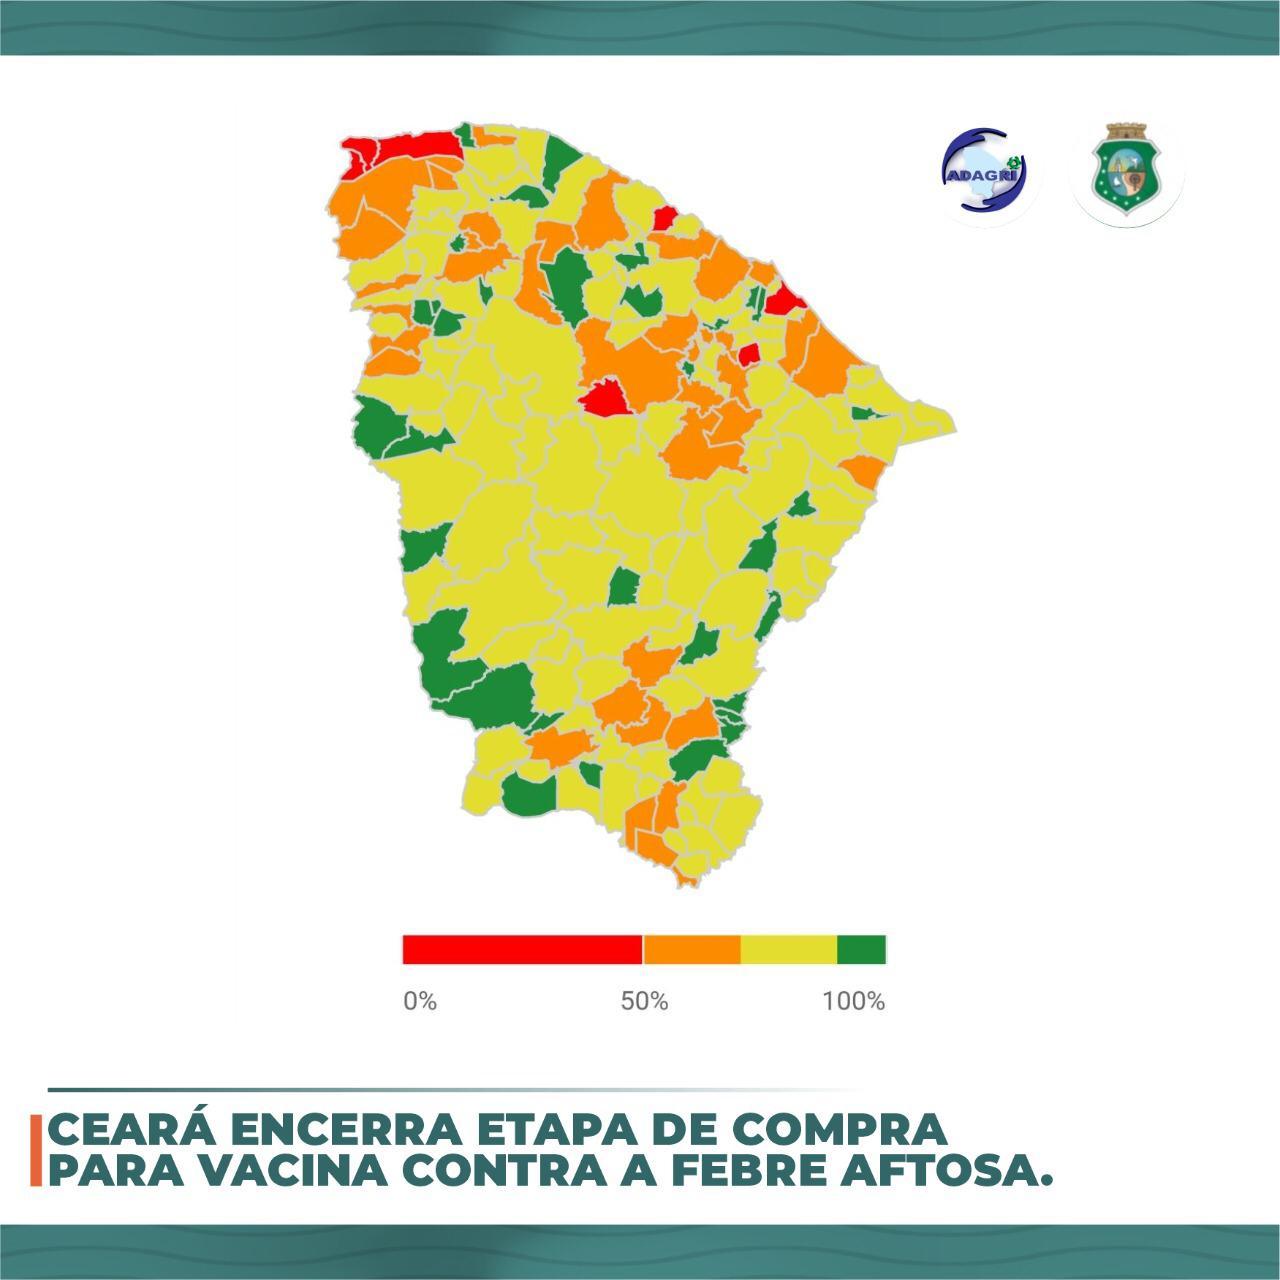 Ceará encerra Etapa de compra da Vacina Contra Febre Aftosa